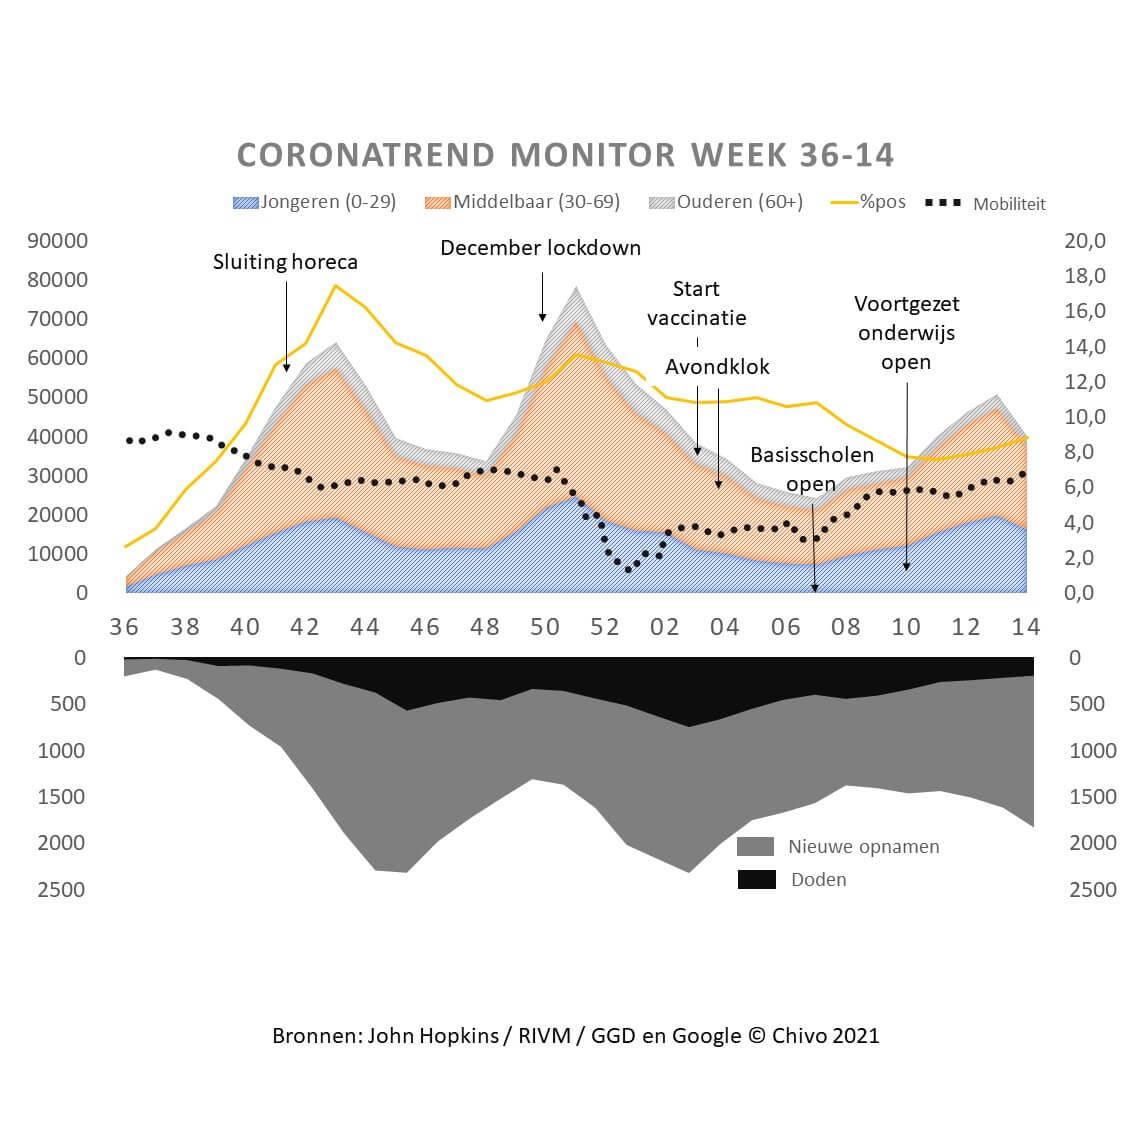 Chivo coronamonitor week 36-14